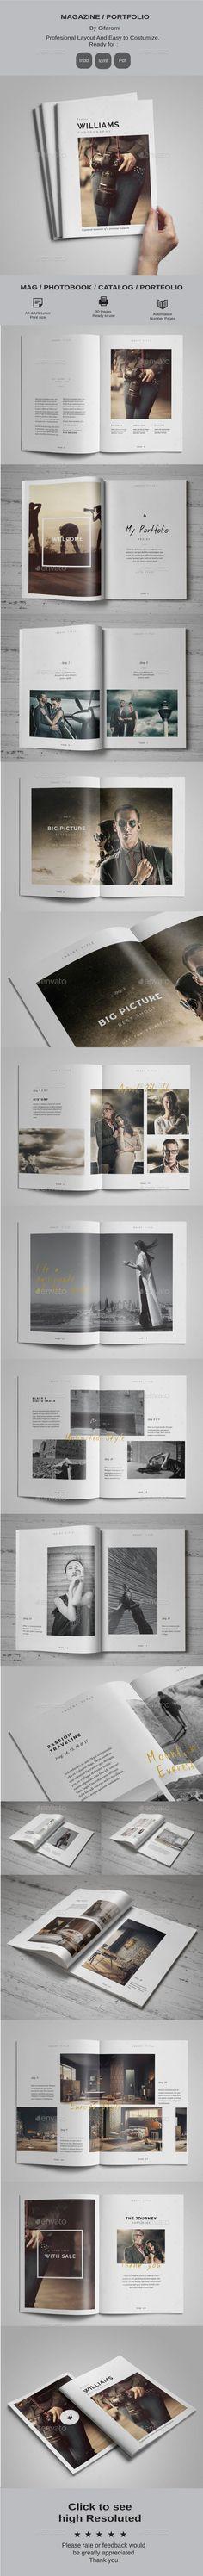 Portfolio / Magazine Template InDesign INDD. Download here: http://graphicriver.net/item/magazine-portfolio-/16700429?ref=ksioks